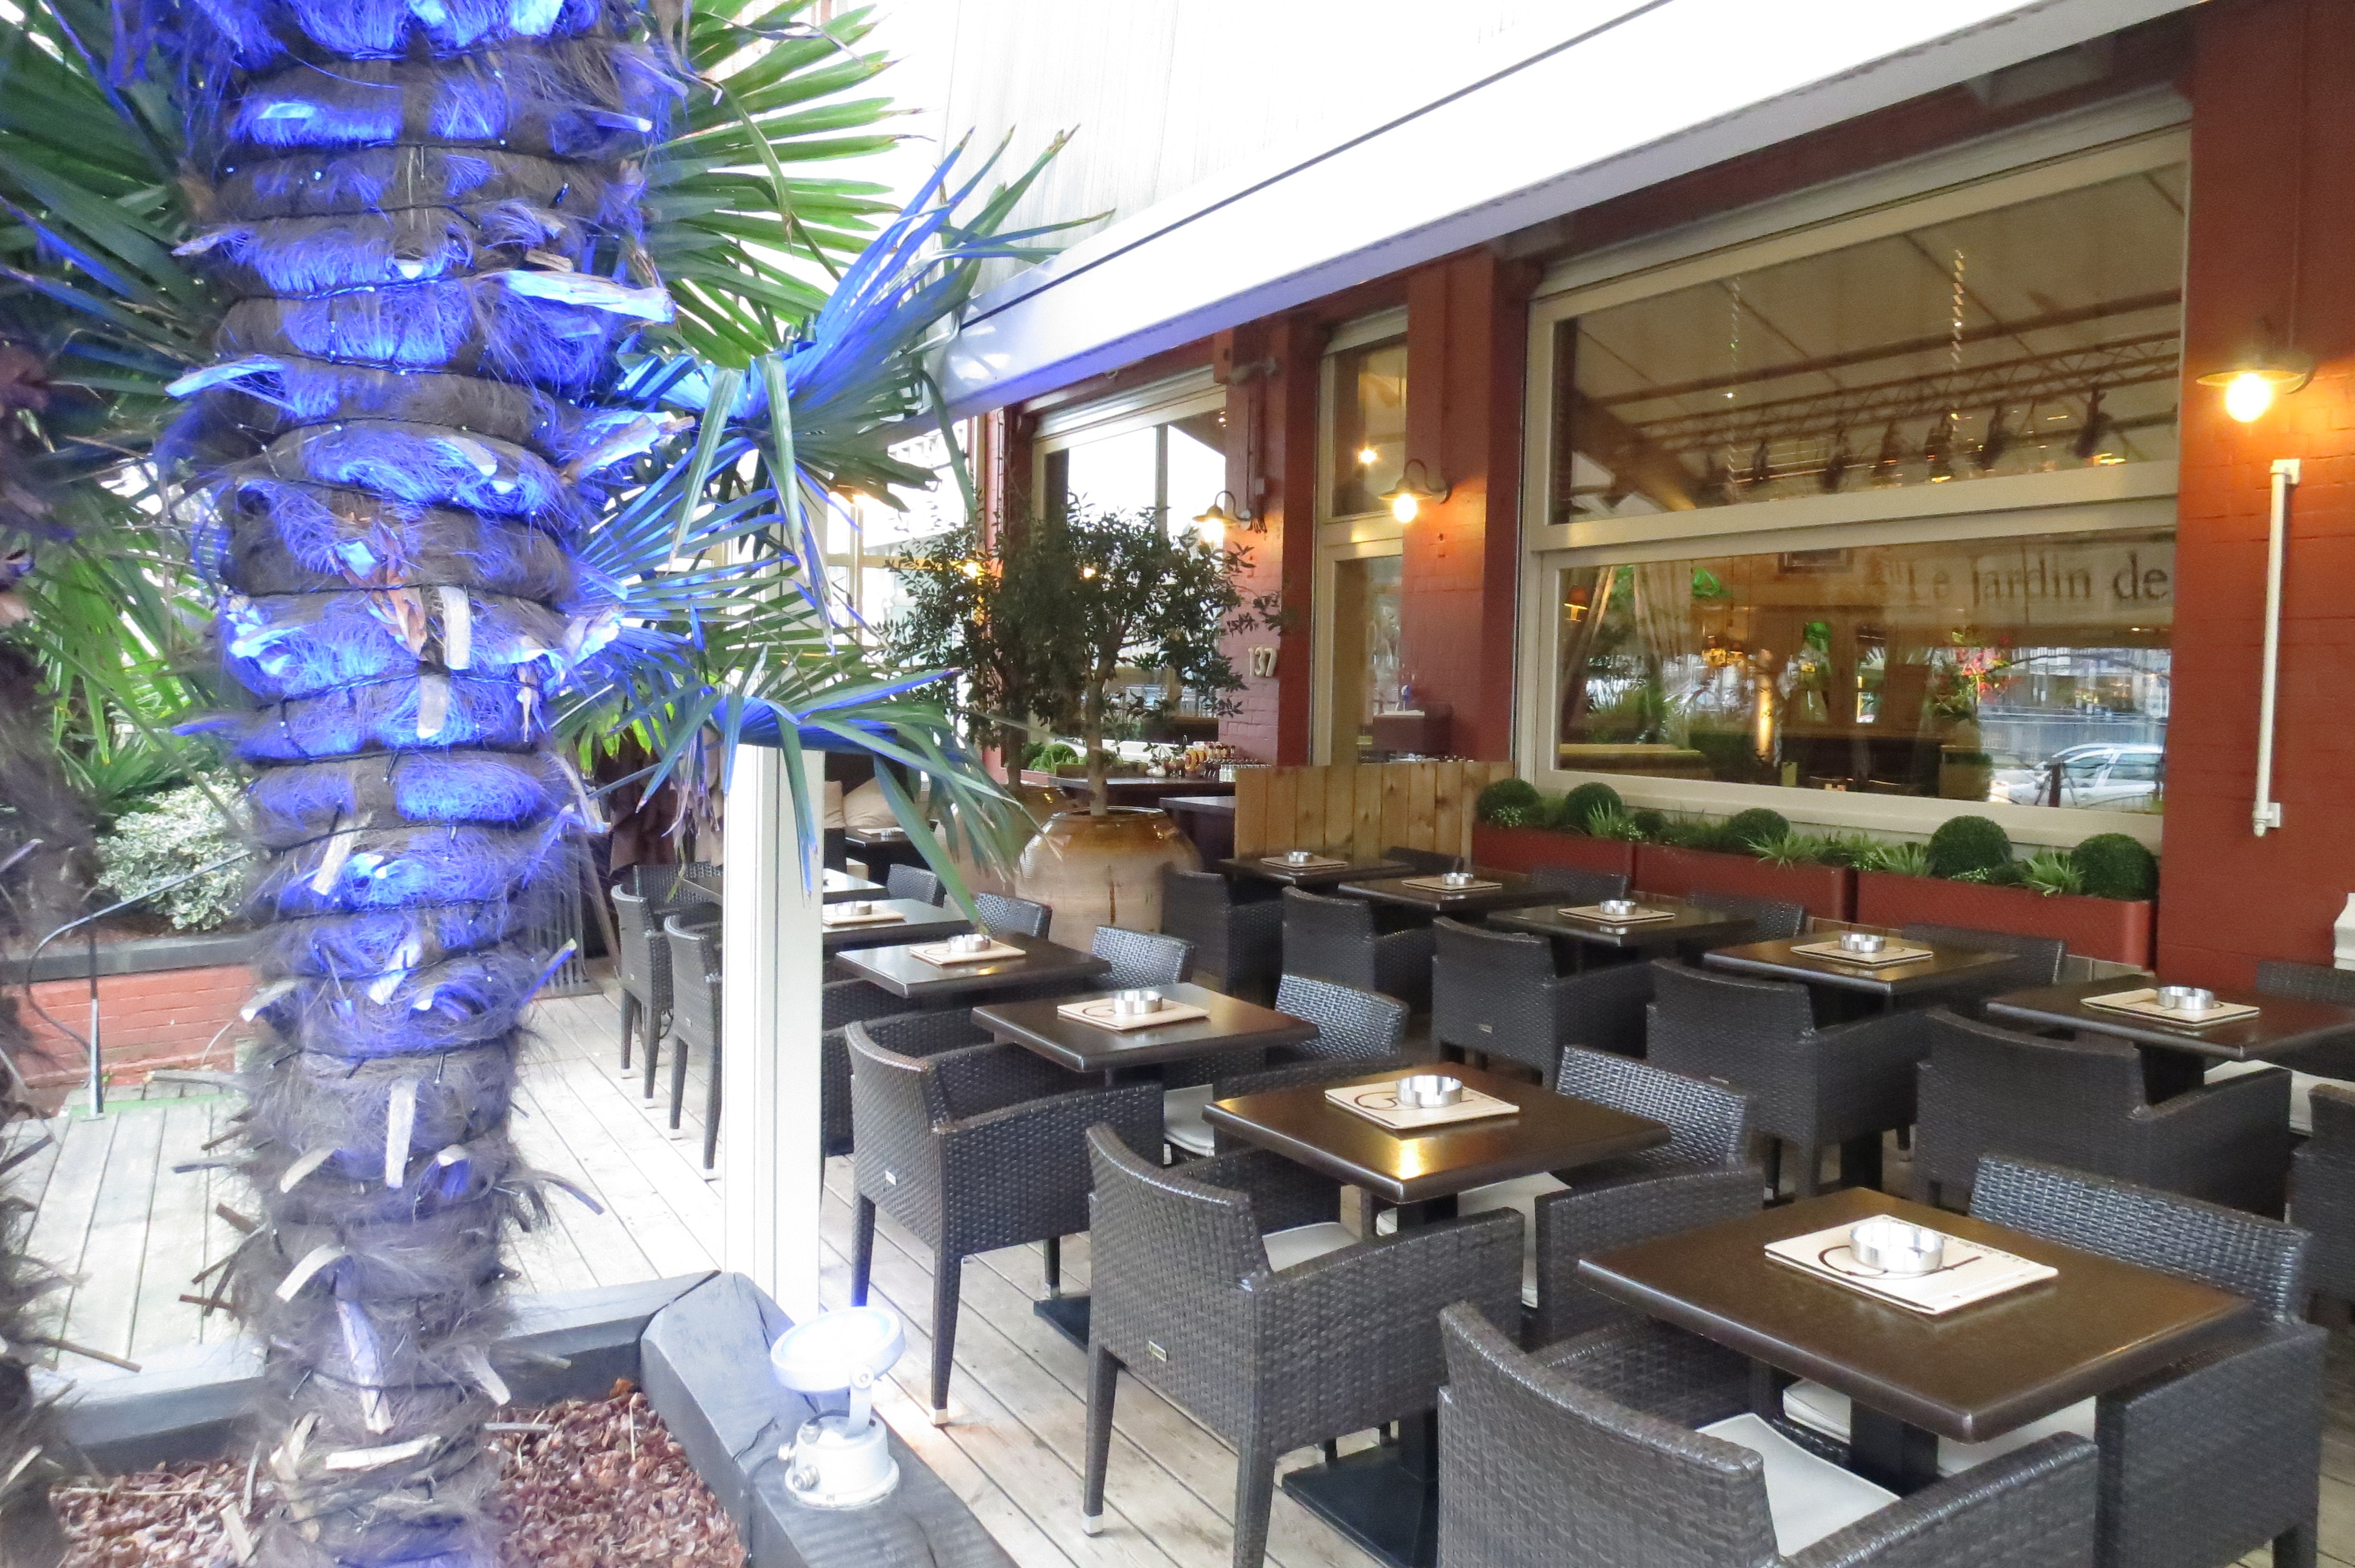 Le jardin de nicolas dress code - Resto terrasse jardin bruxelles nanterre ...